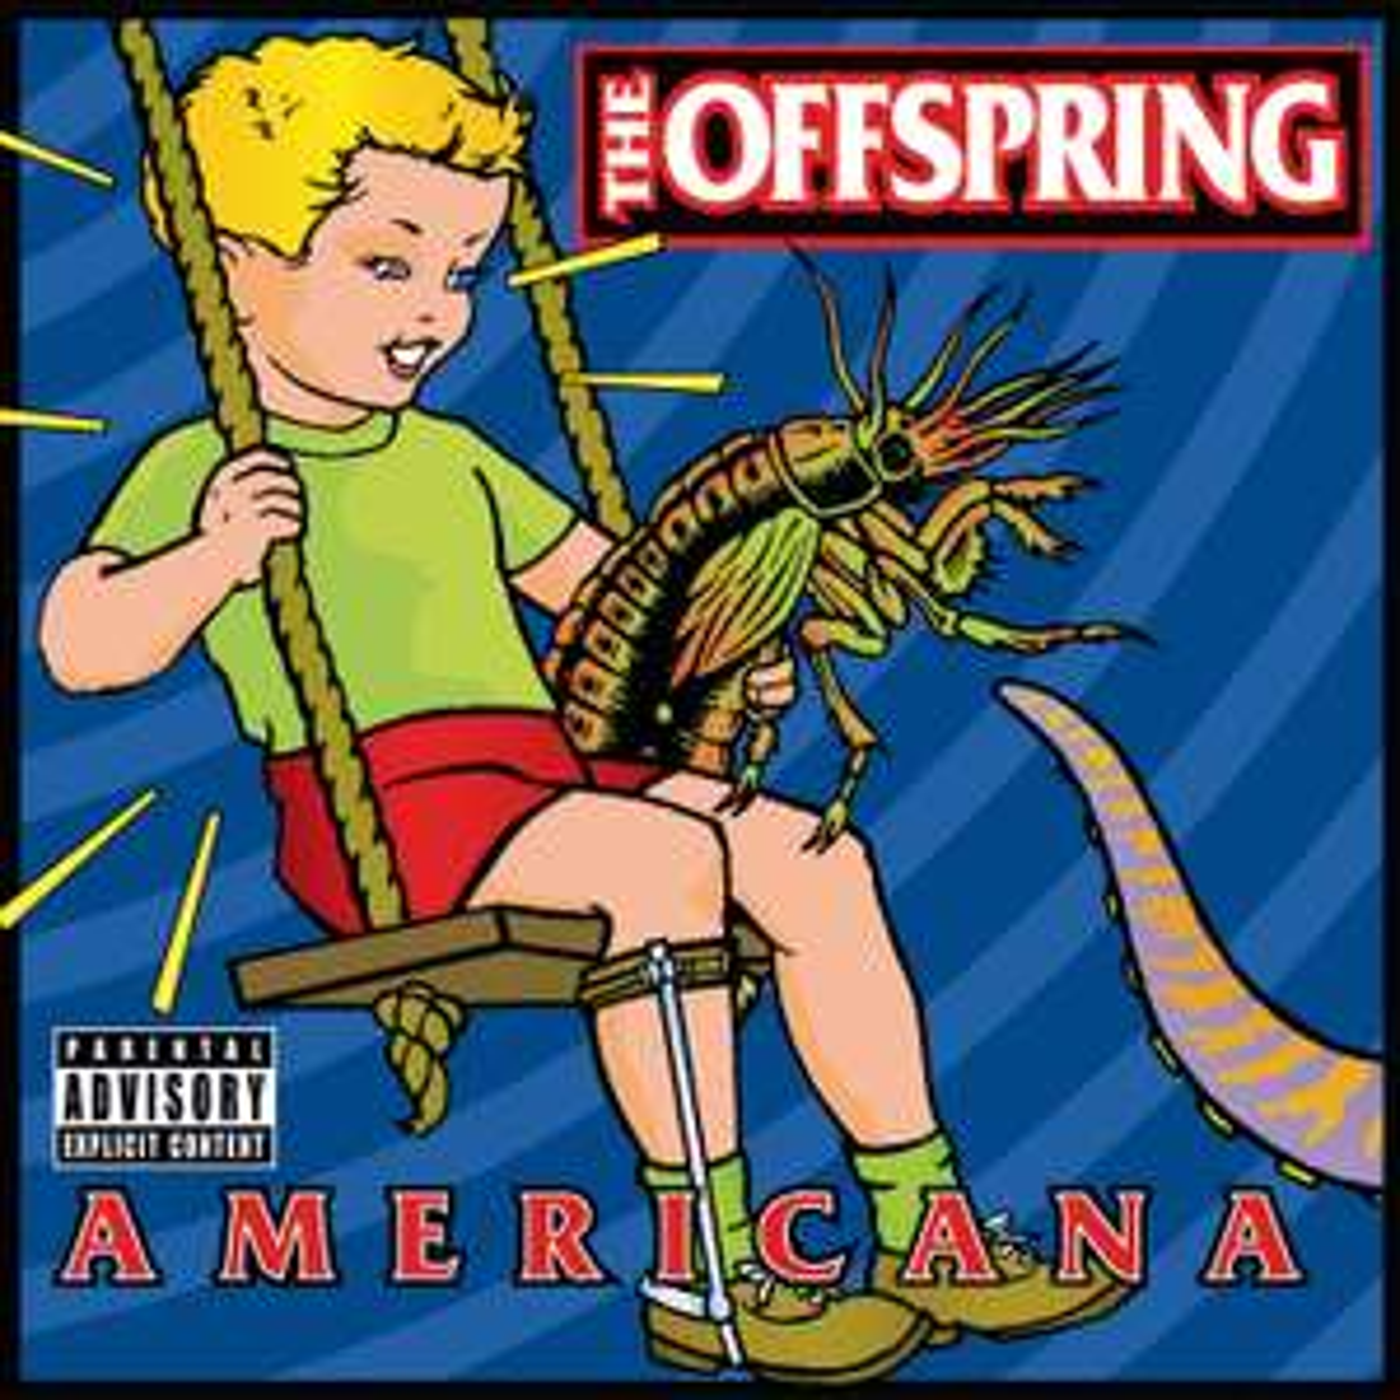 Vinyle The Offspring - Americana